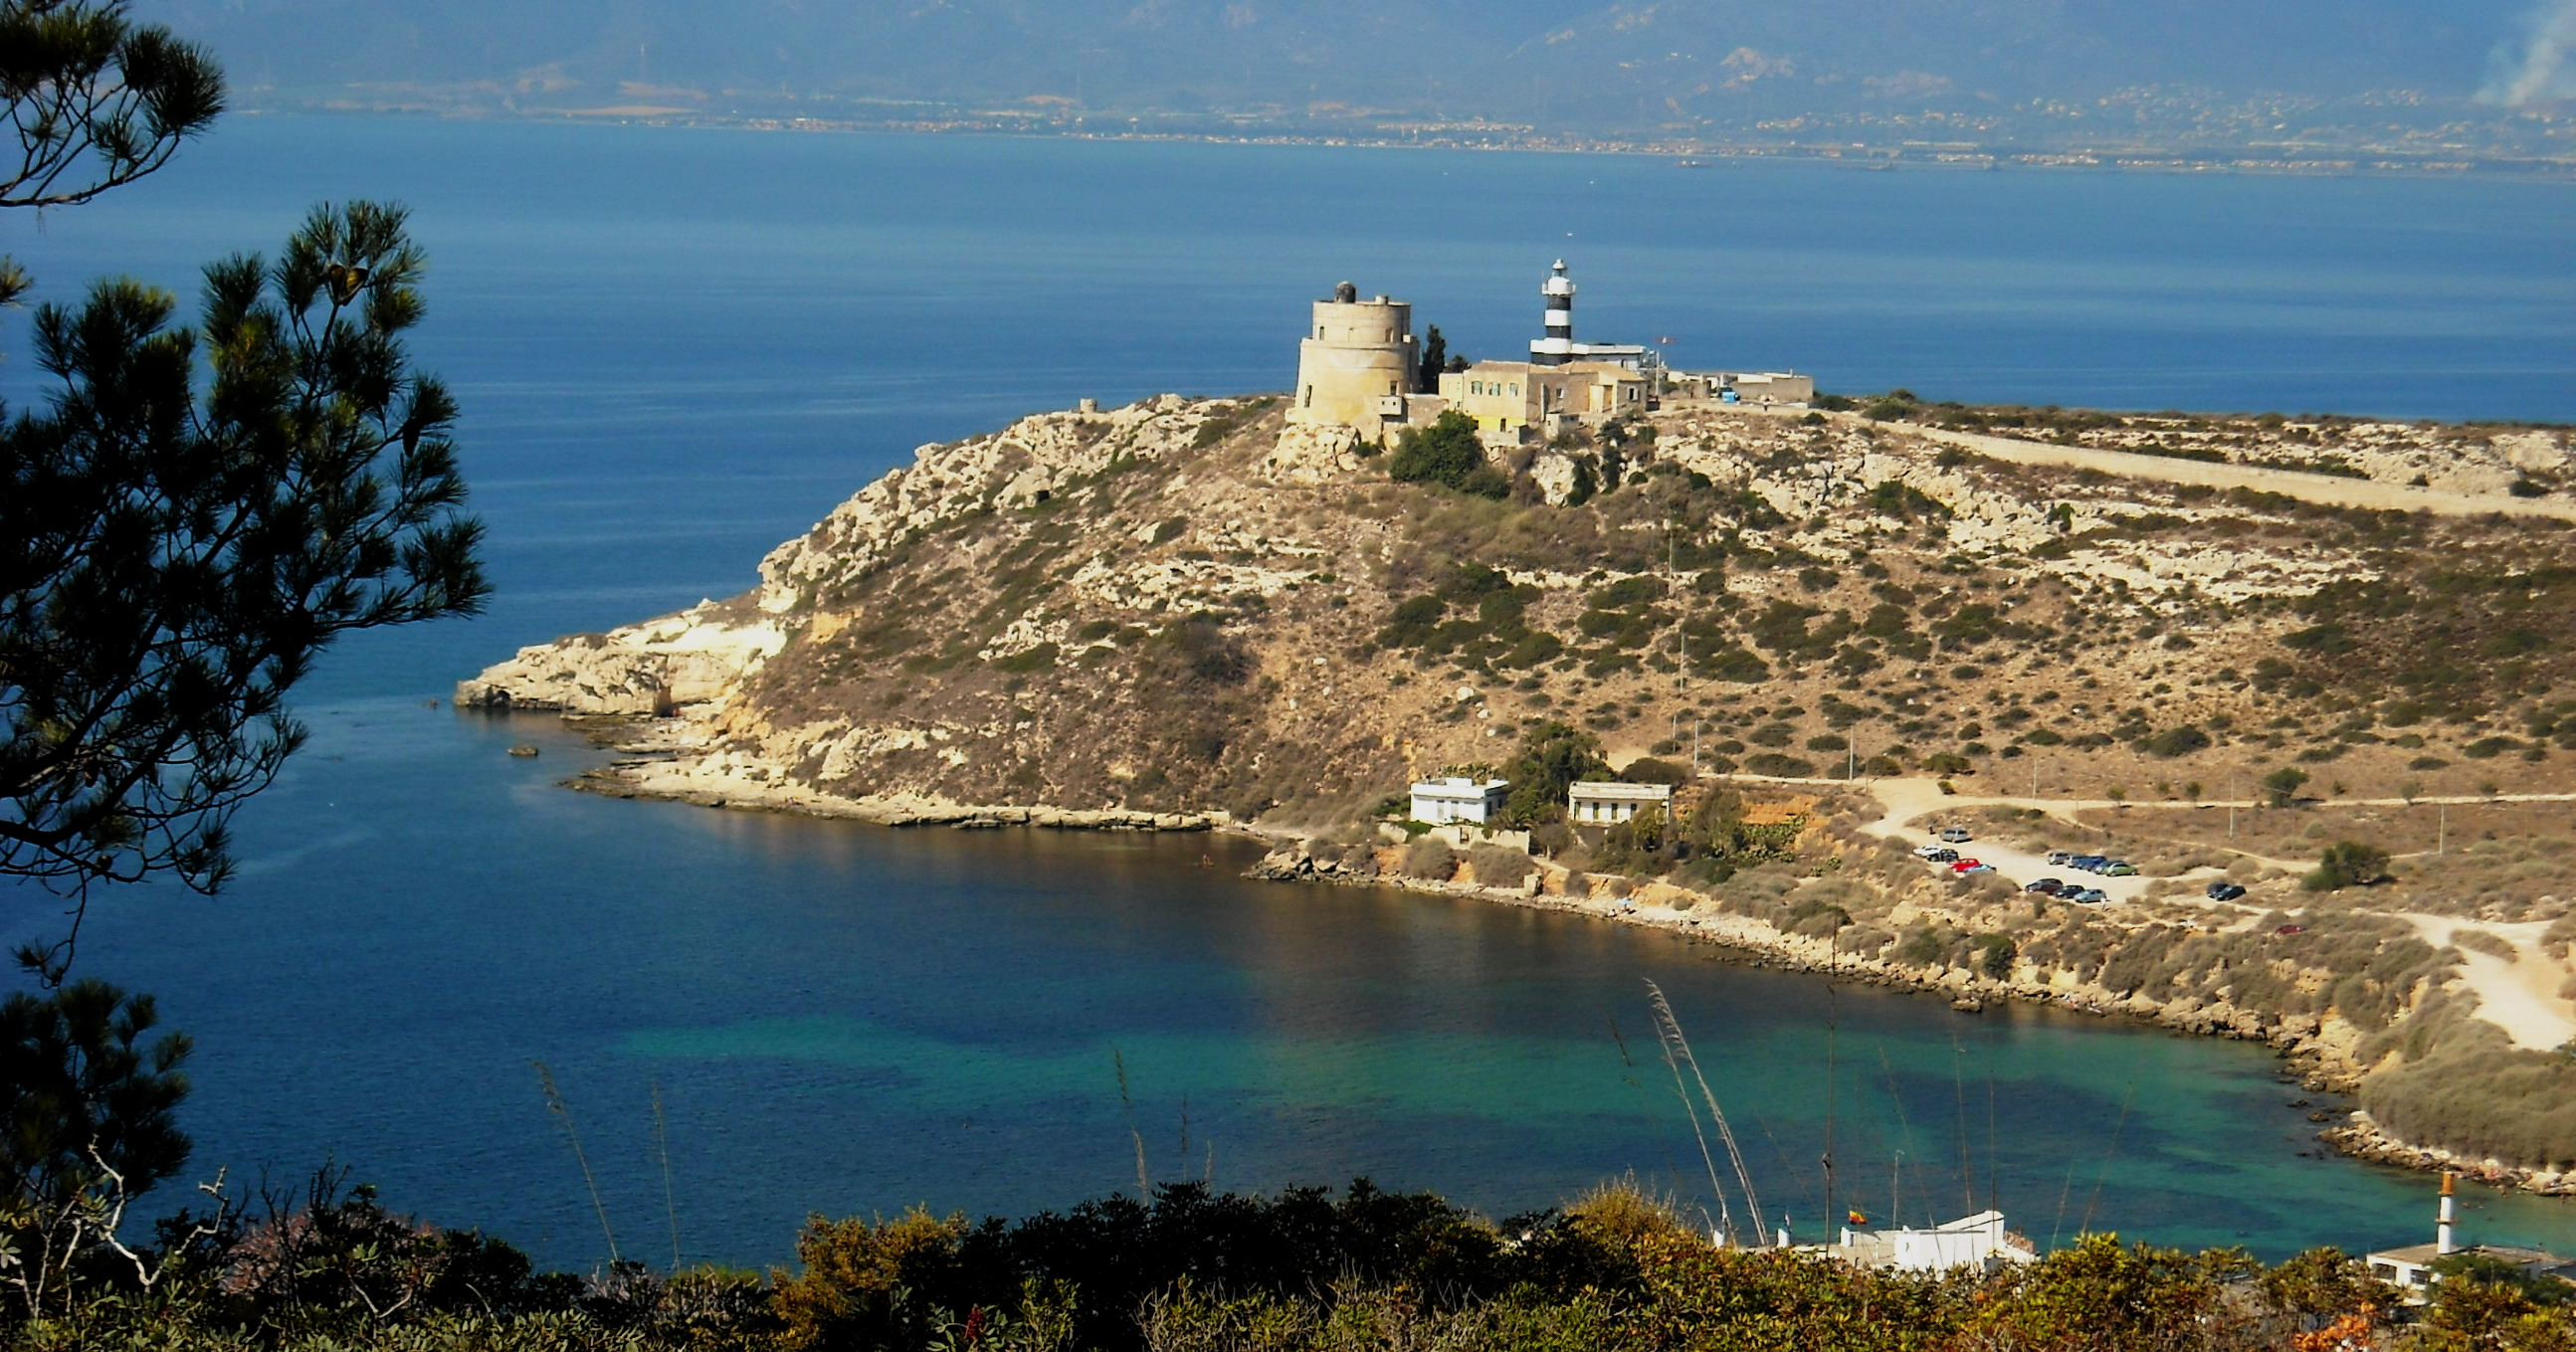 File:Torre e faro di Calamosca.jpg - Wikimedia Commons